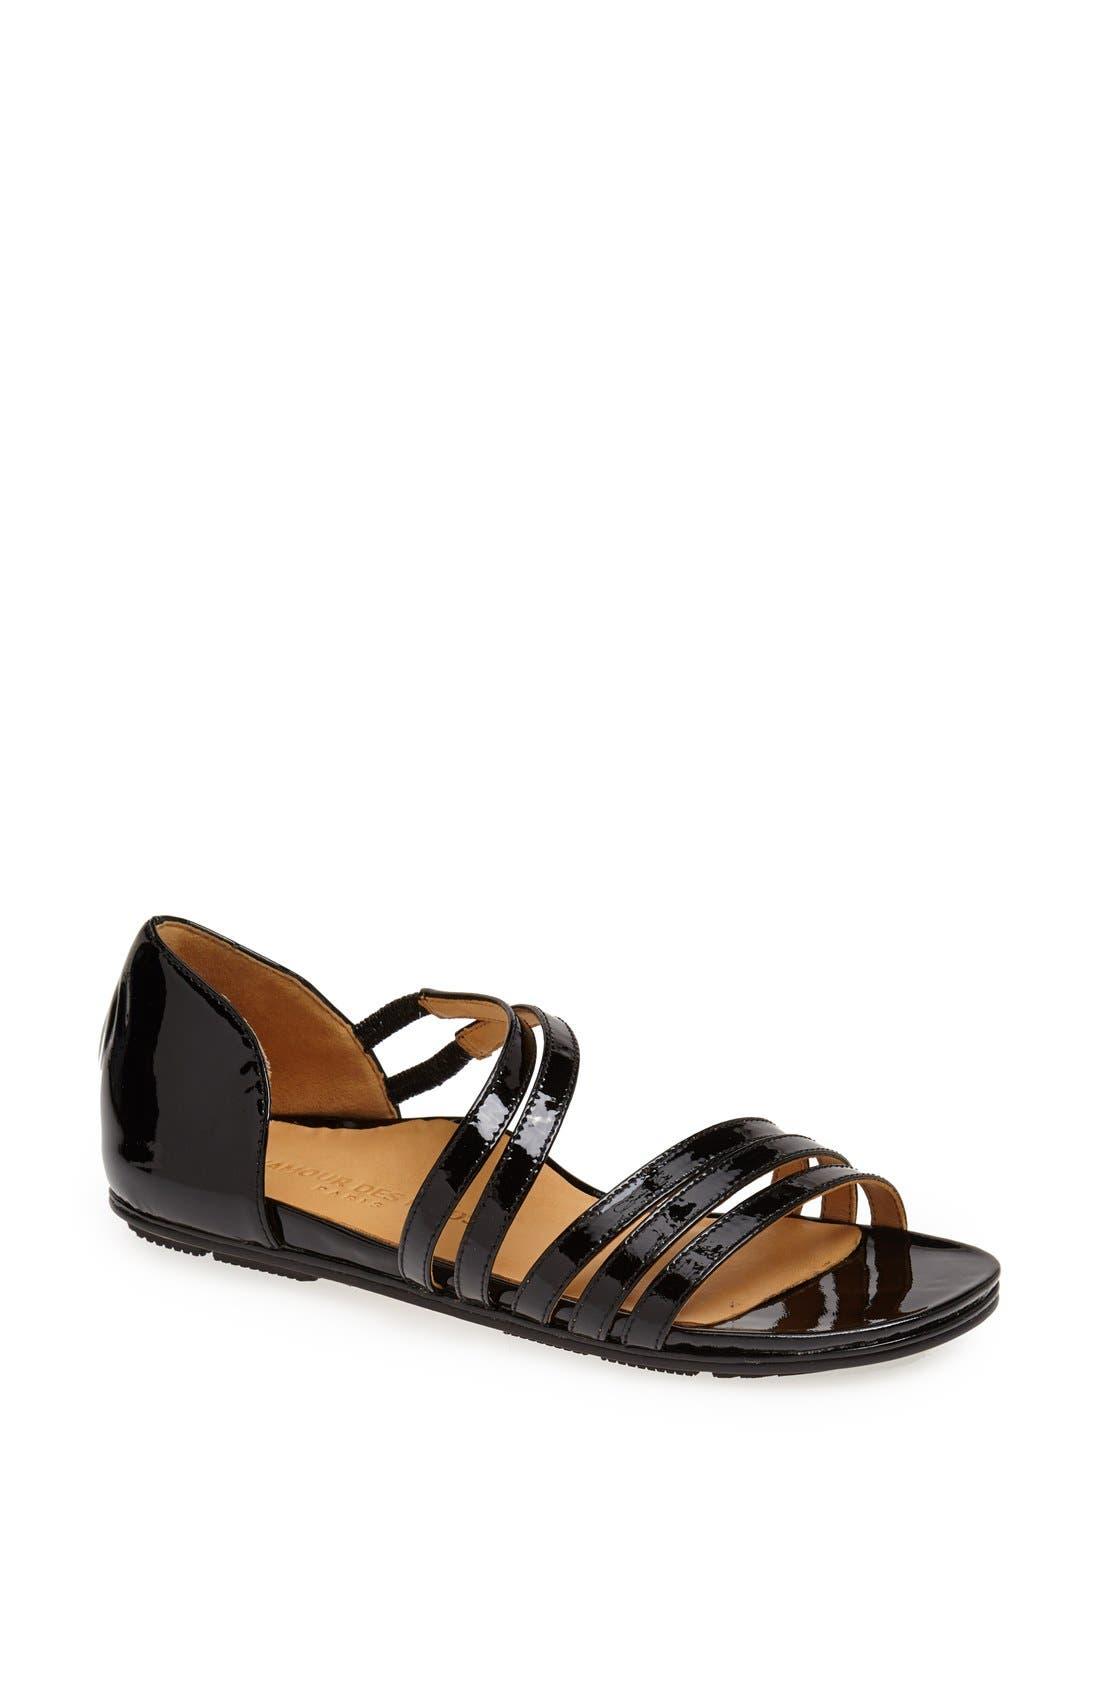 Alternate Image 1 Selected - L'Amour des Pieds'Dolce' Sandal